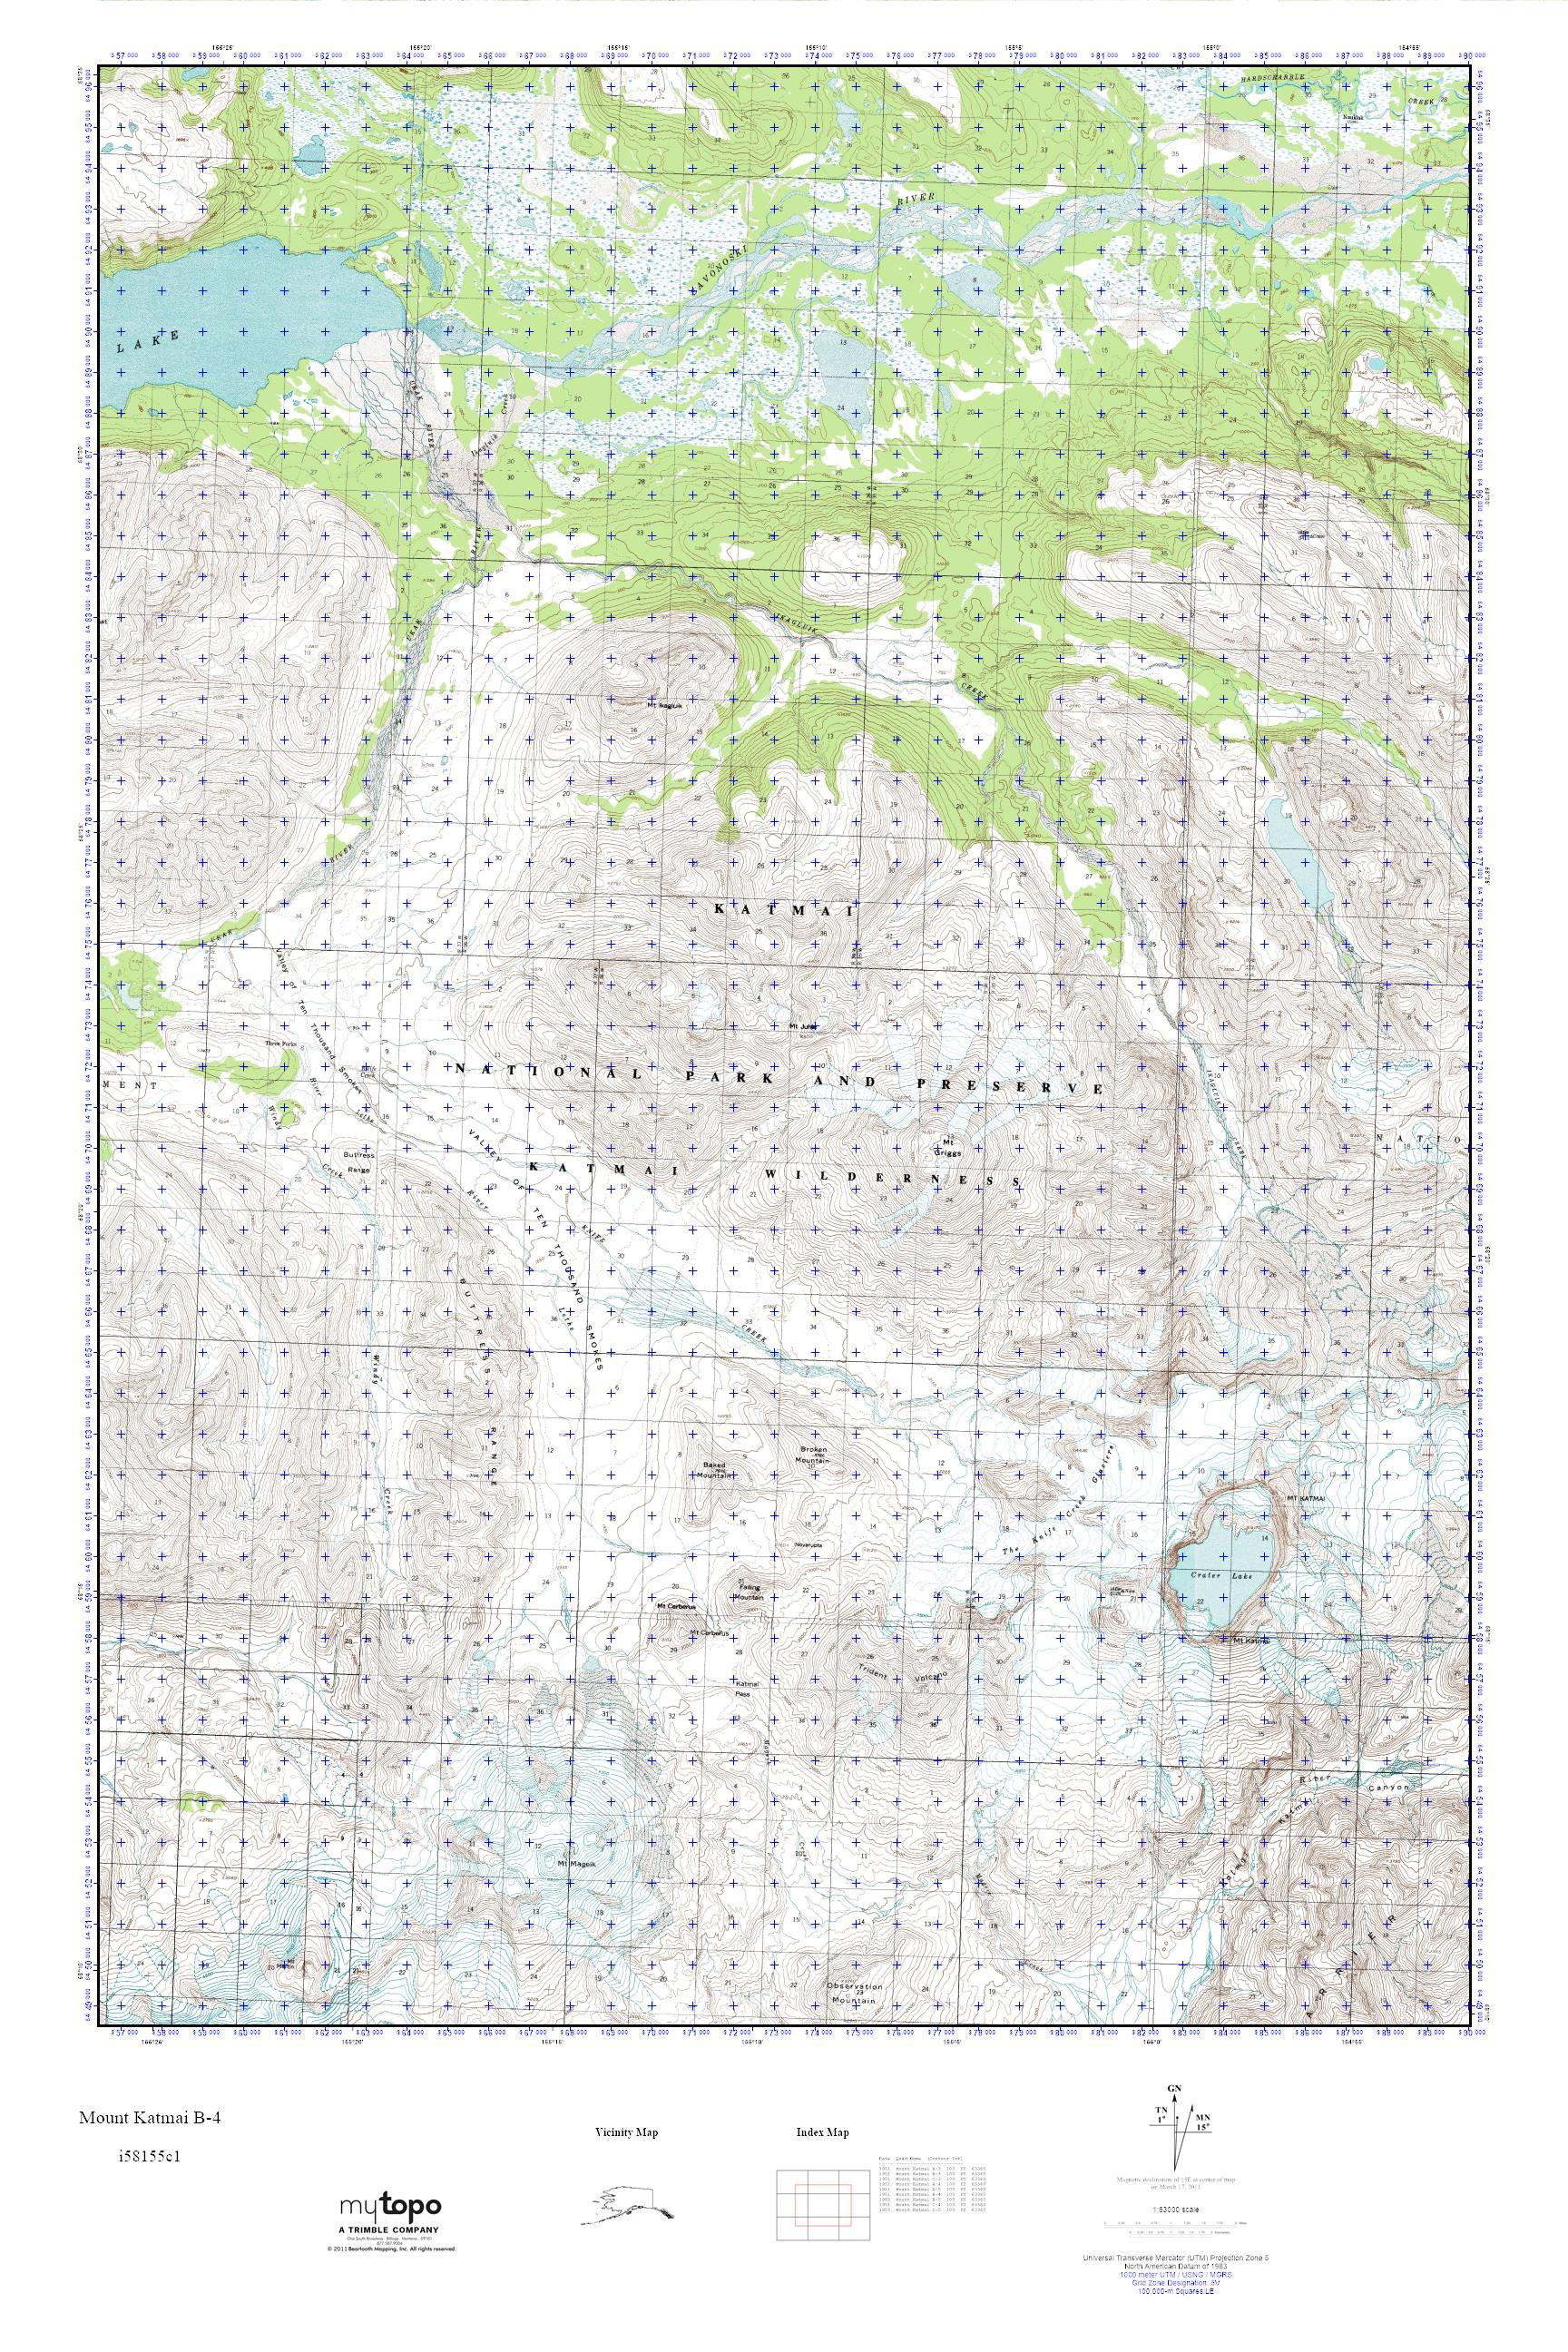 MyTopo Mount Katmai B4 Alaska USGS Quad Topo Map